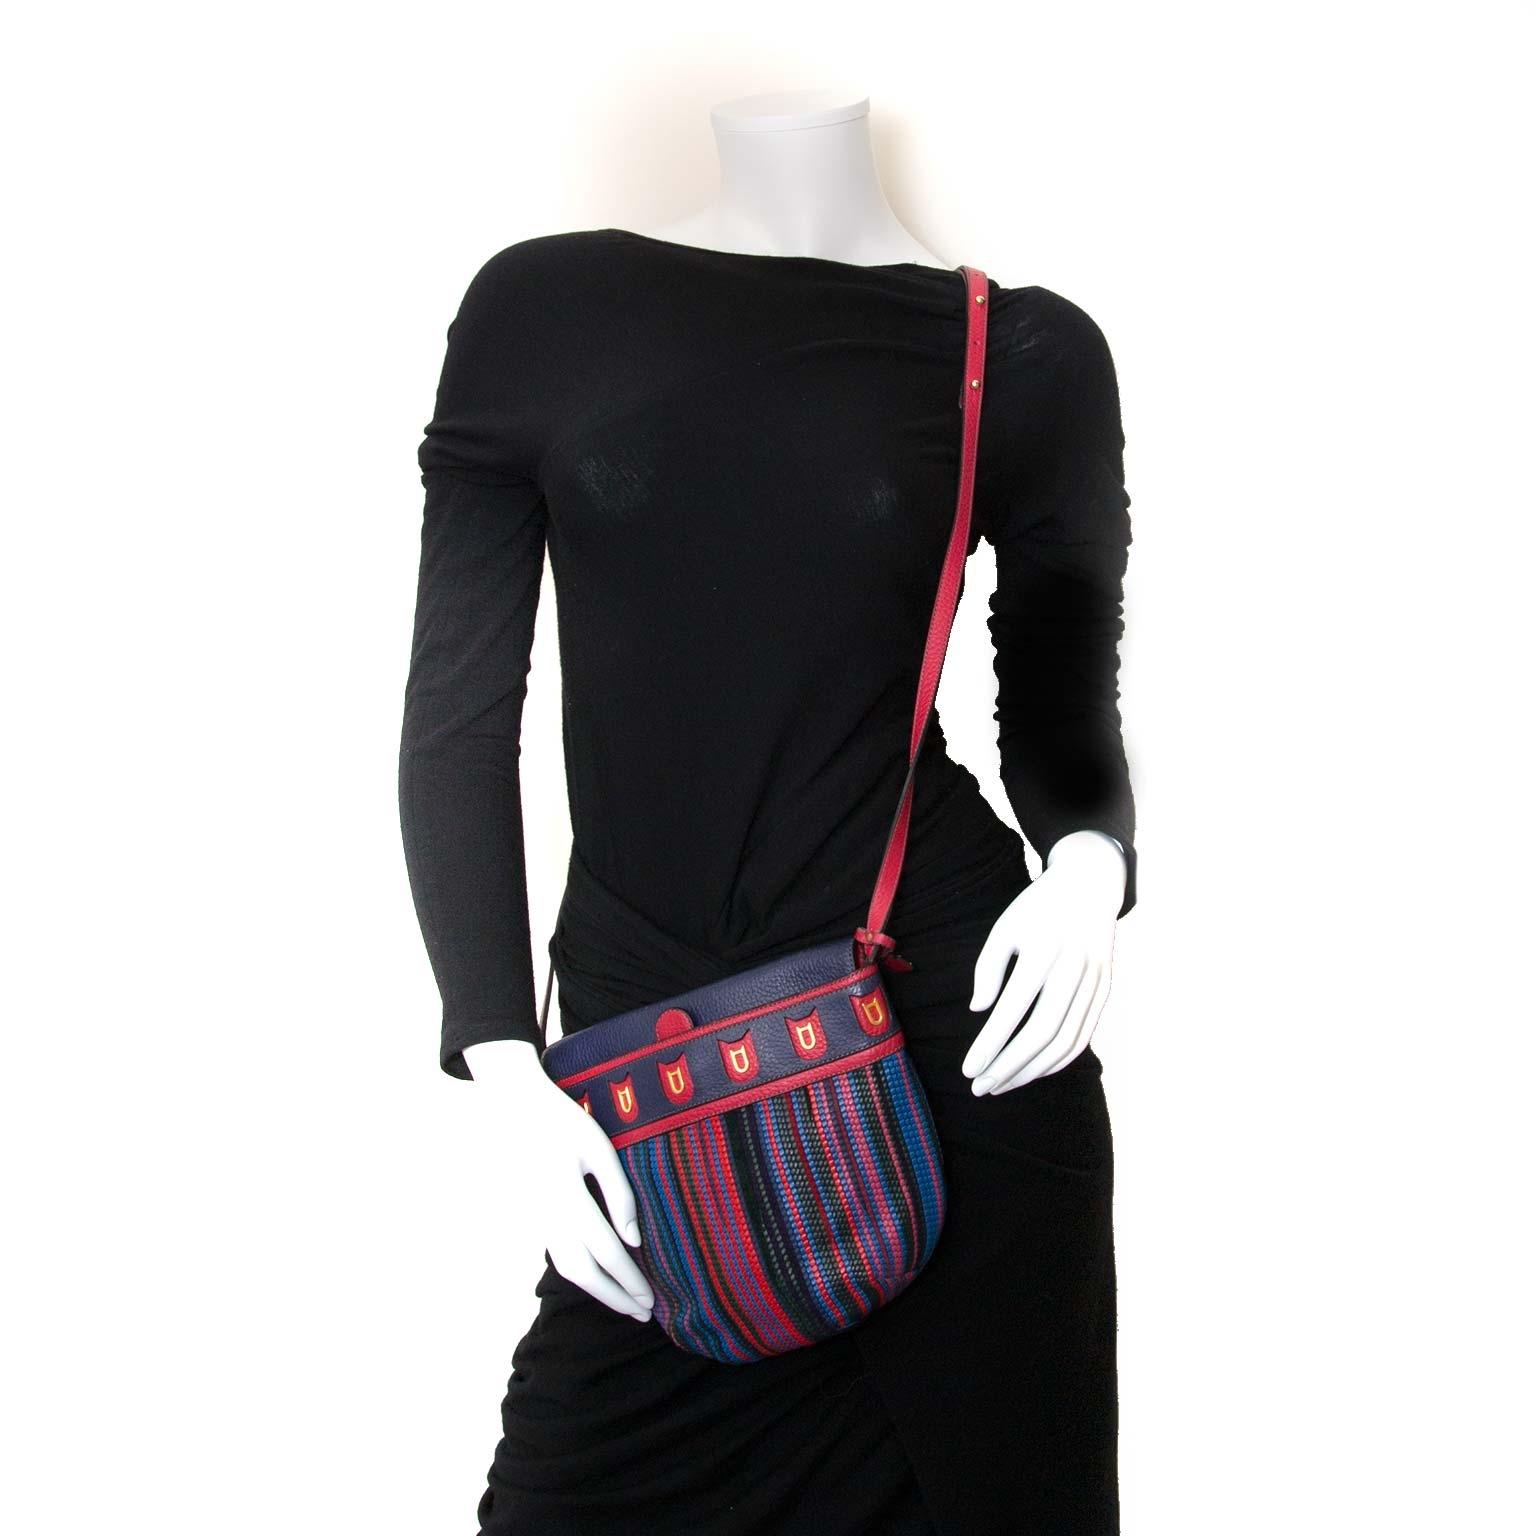 delvaux multicolor toile de cuir crossbody bag now for sale at labellov vintage fashion webshop belgium